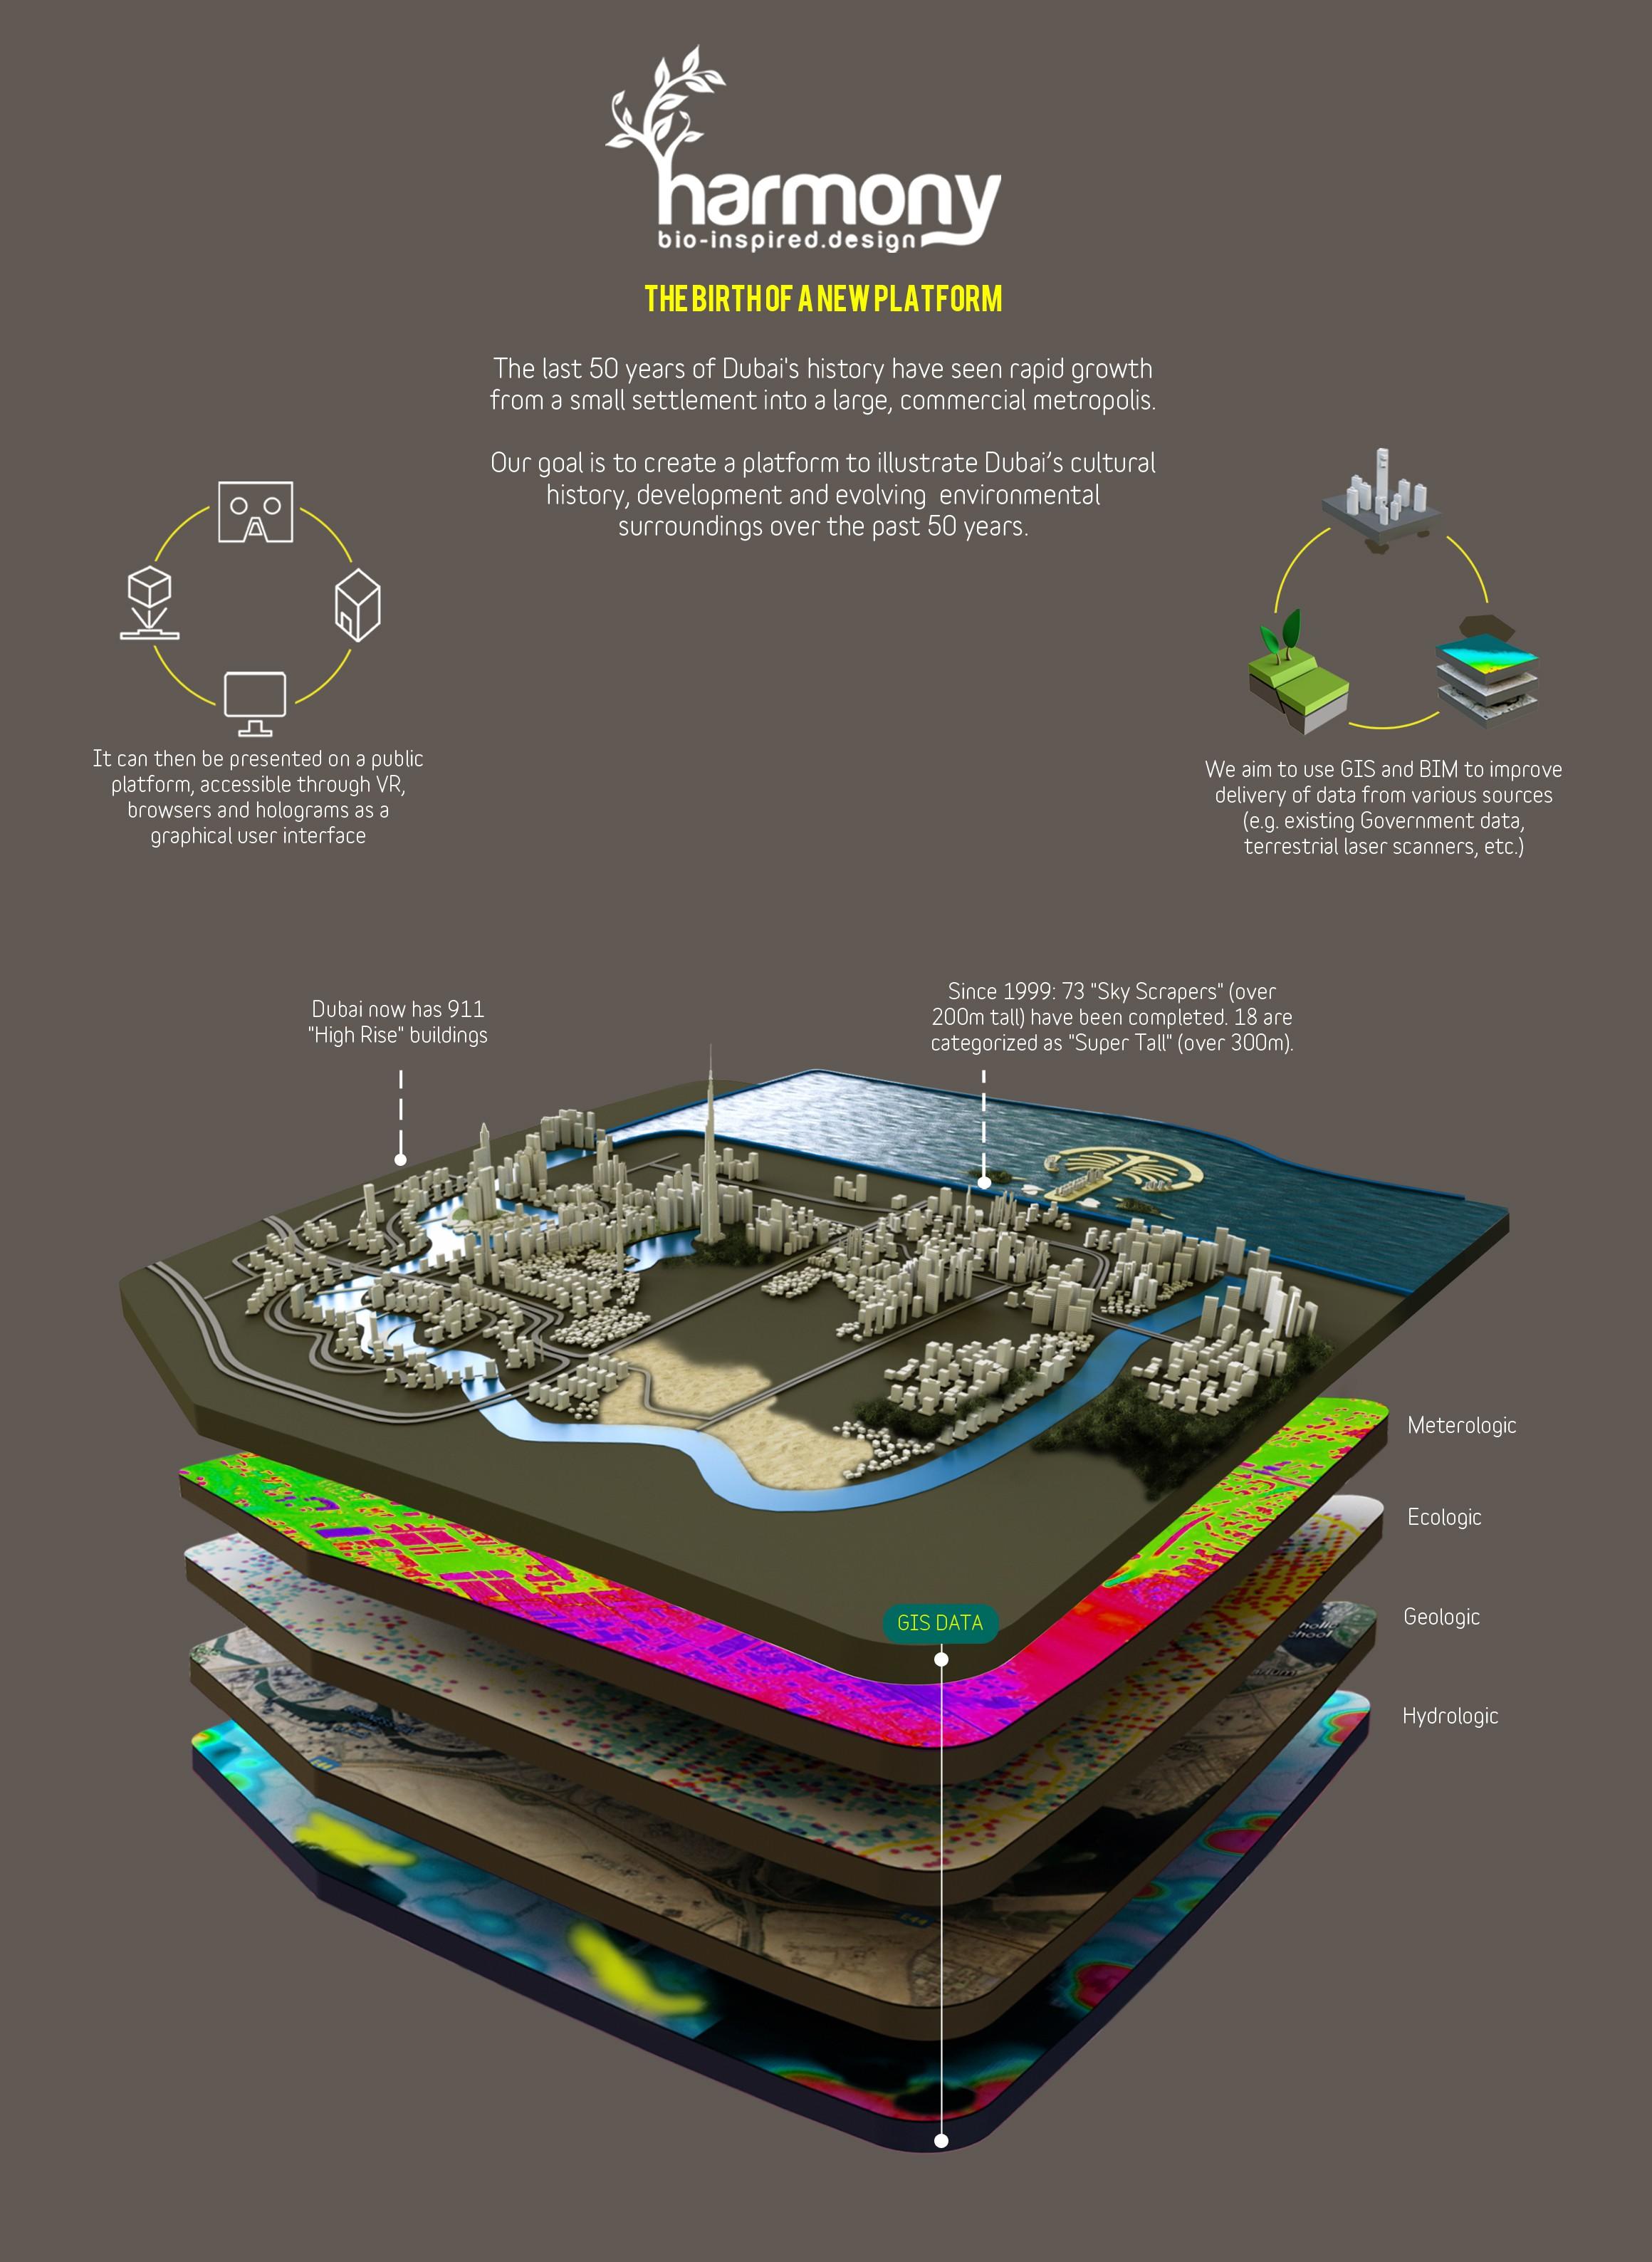 3D city model infographic - to show Dubai's development over time.